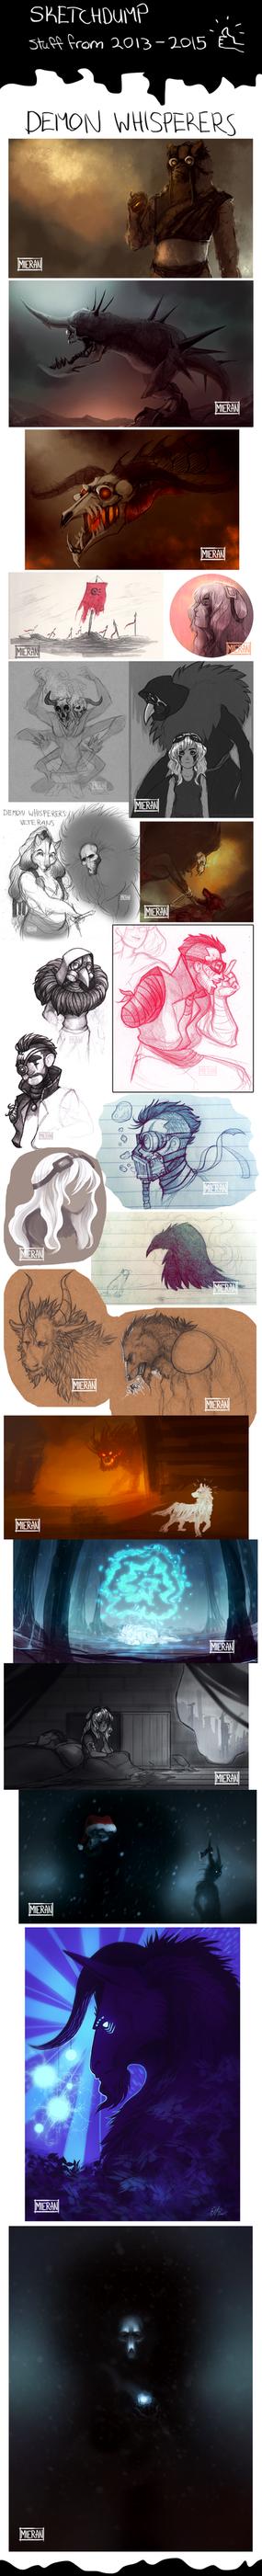 DW Sketchdump 2013-2015 by TheSnowDragon